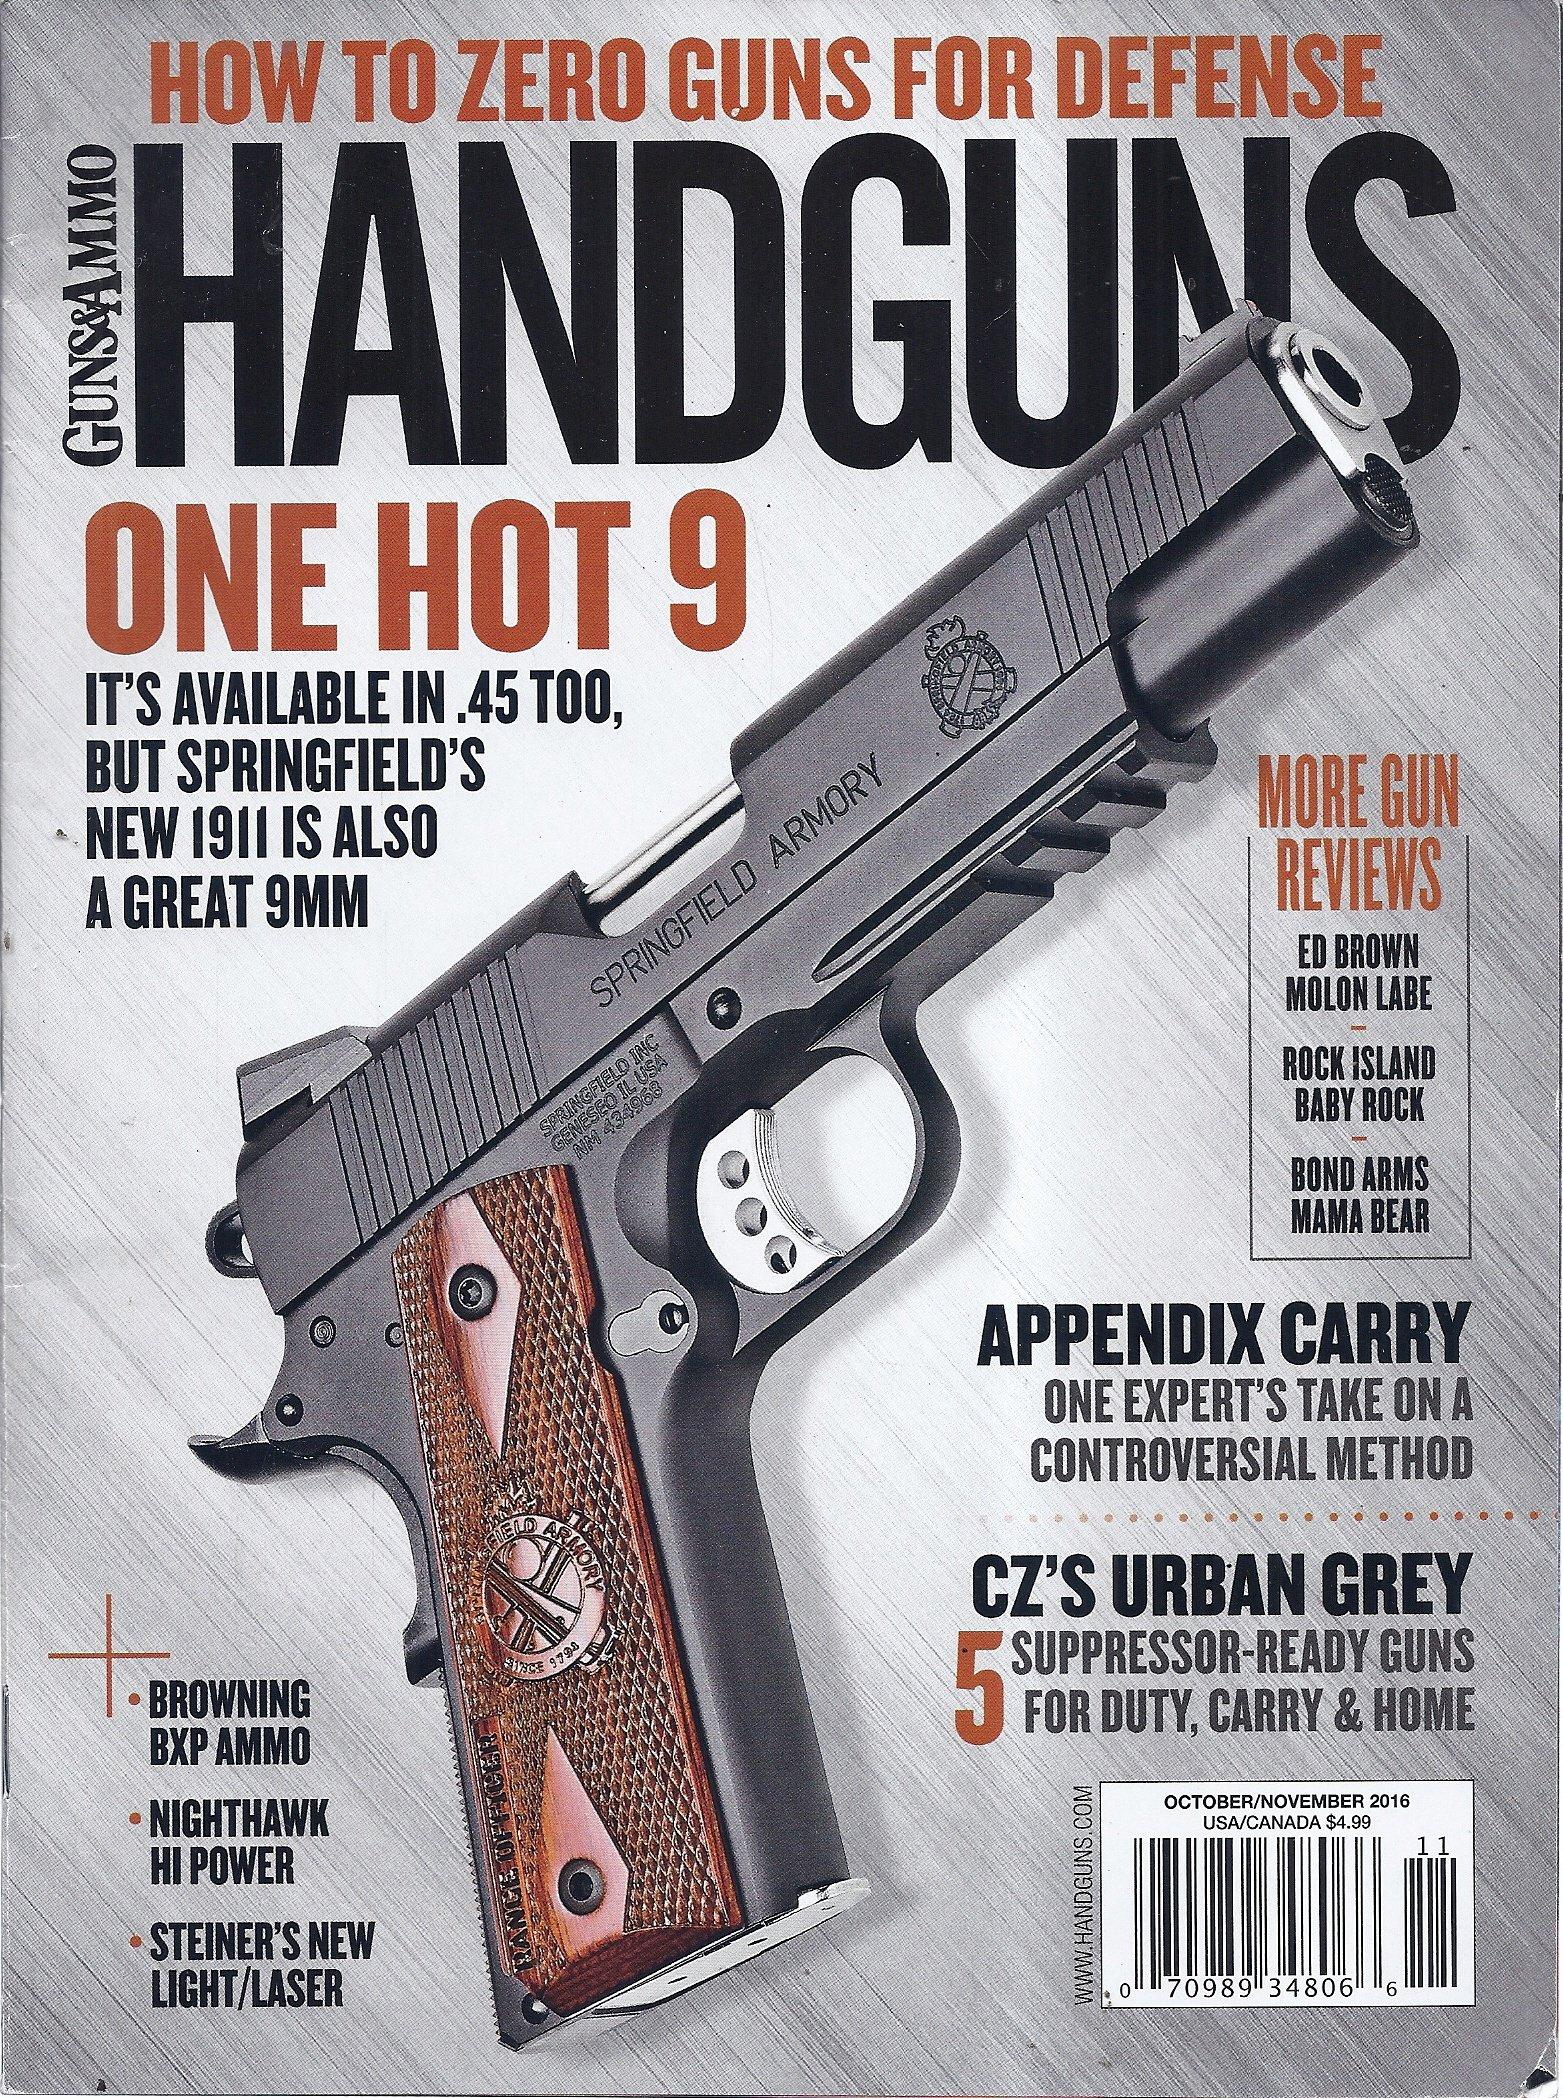 Handguns Magazine (Guns & Ammo - October/November 2016